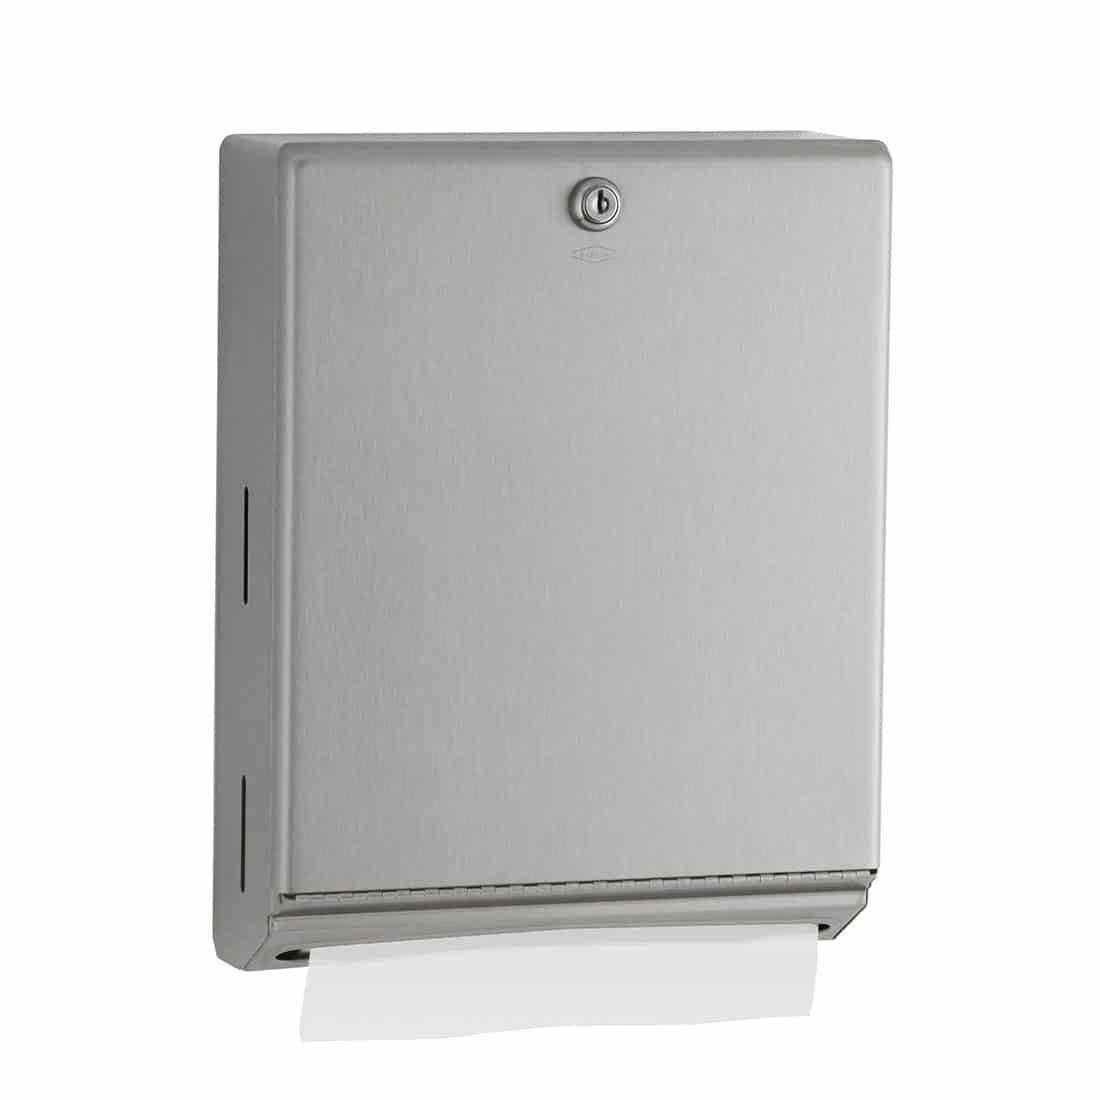 Bobrick Surface Mount Paper Towel Dispenser B 262